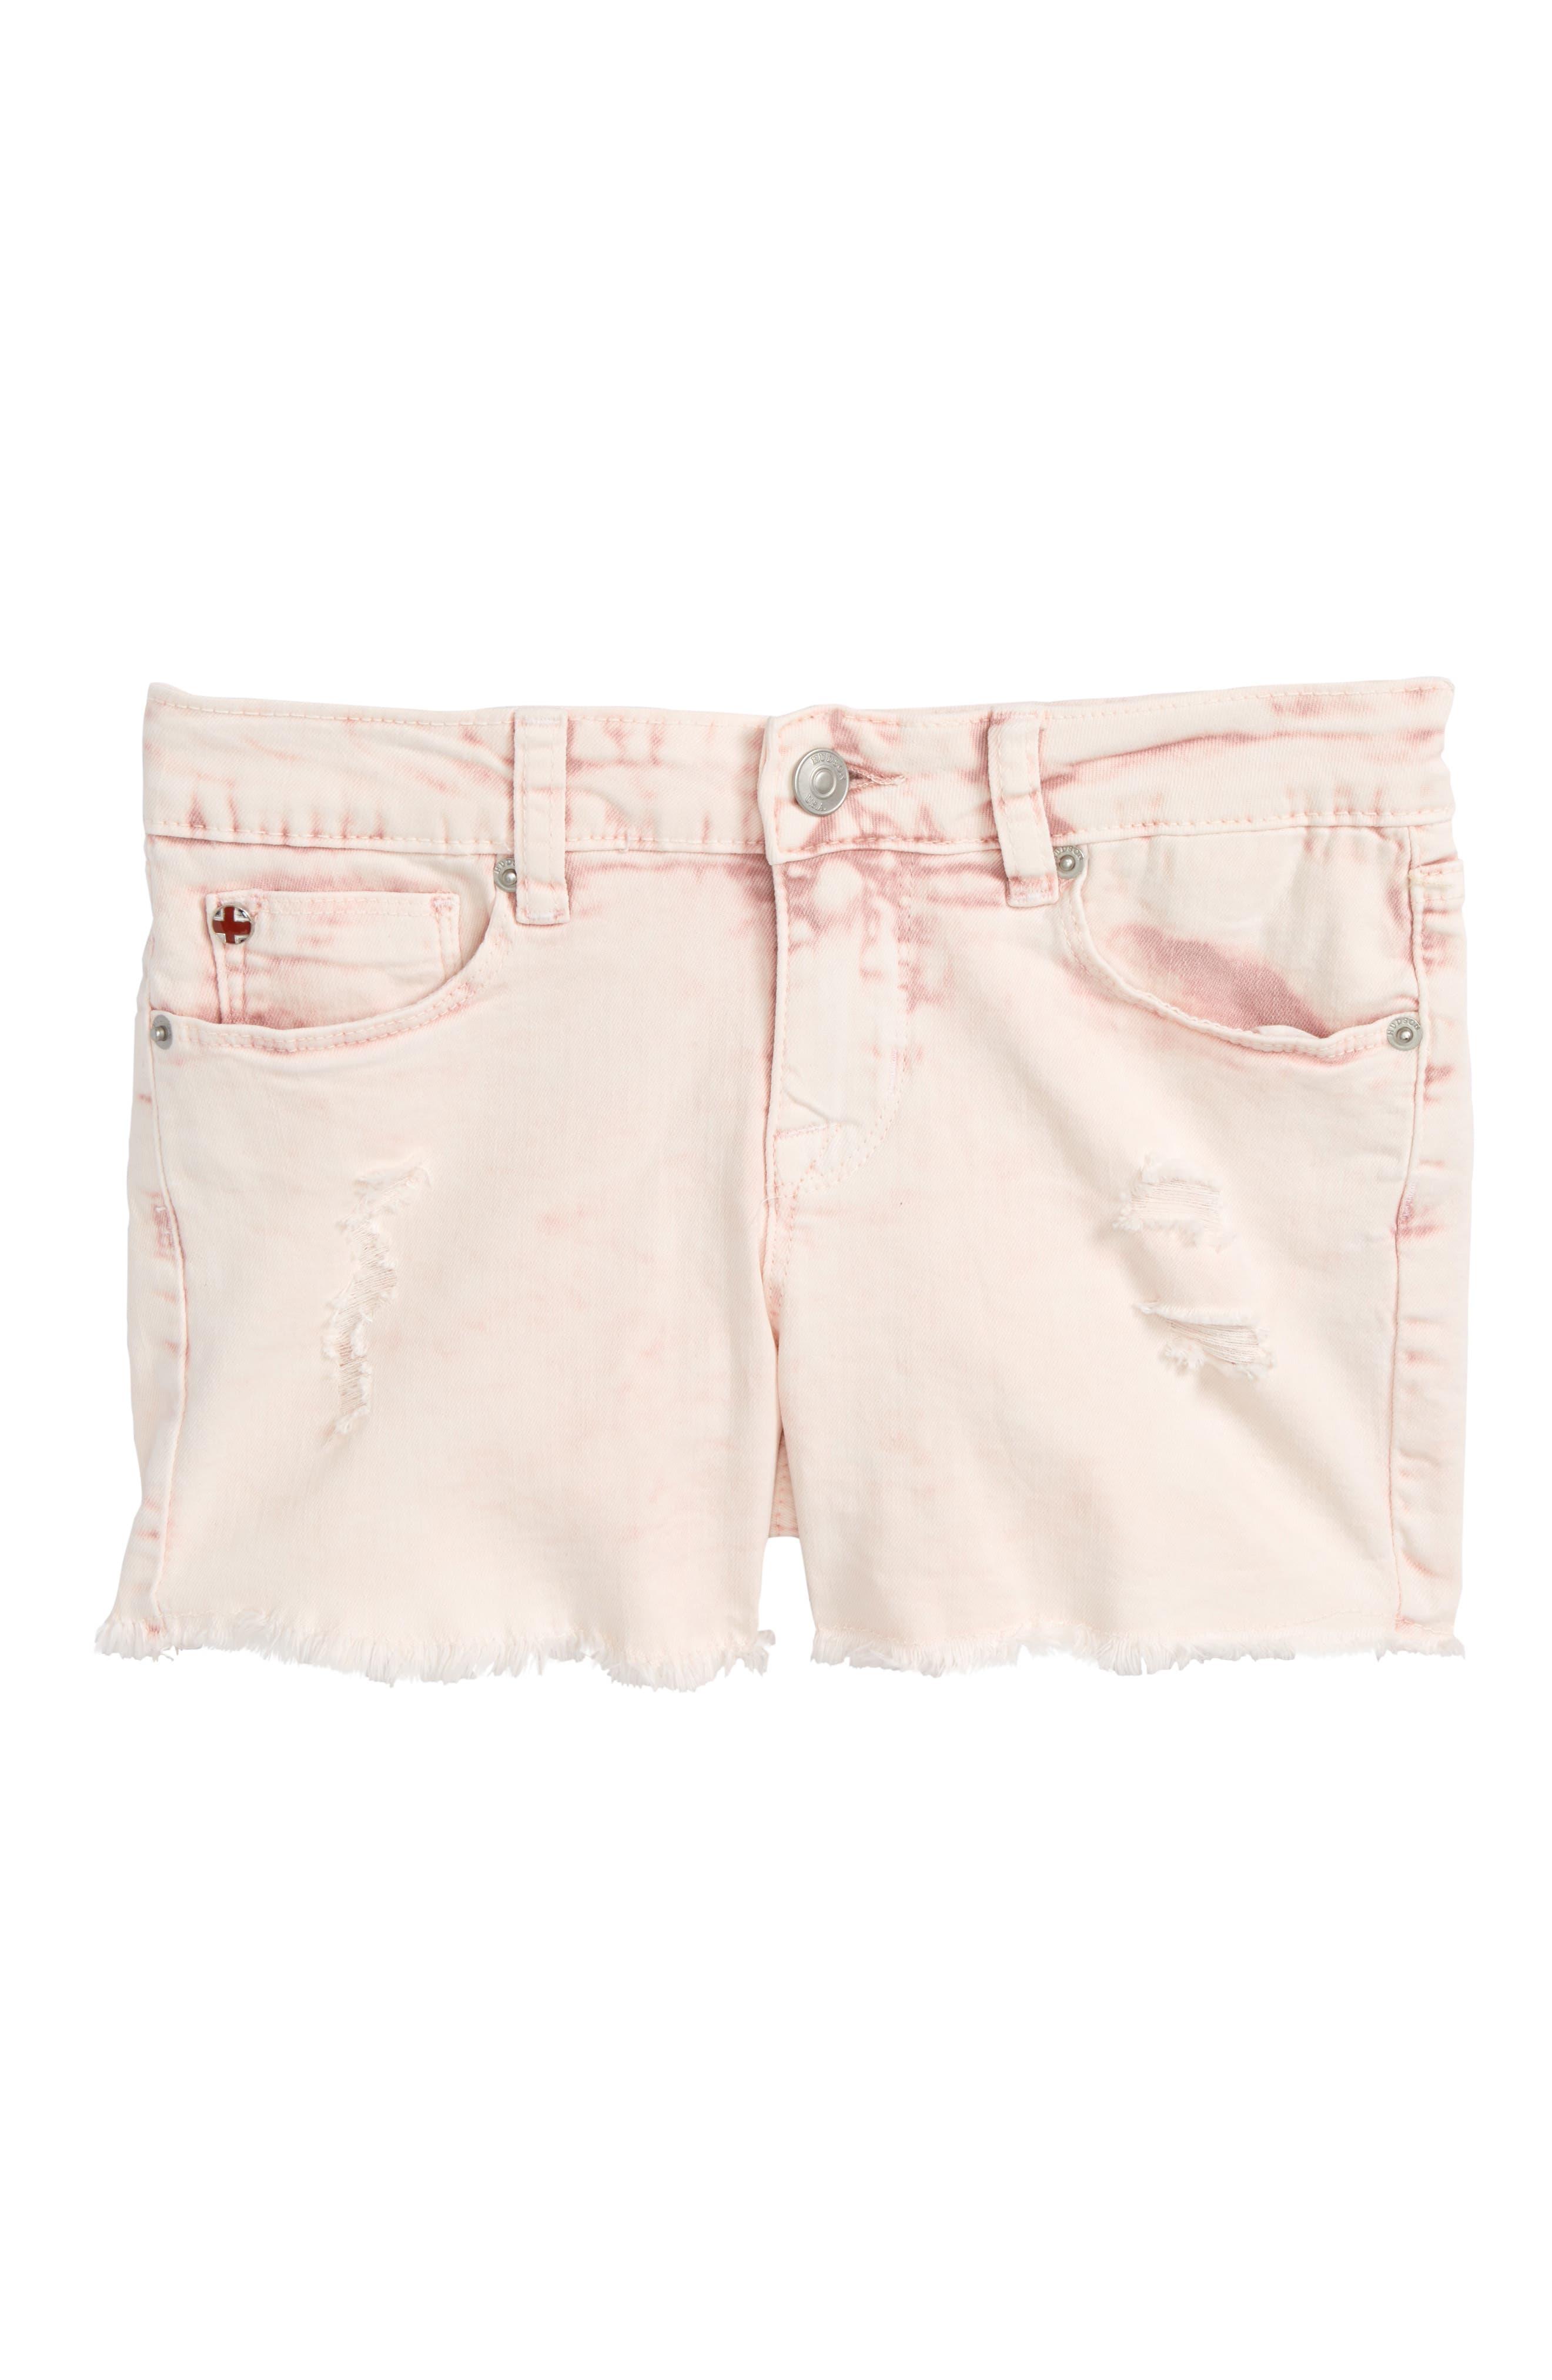 Frayed Acid Wash Shorts,                         Main,                         color, Pink Coral Acid Wash